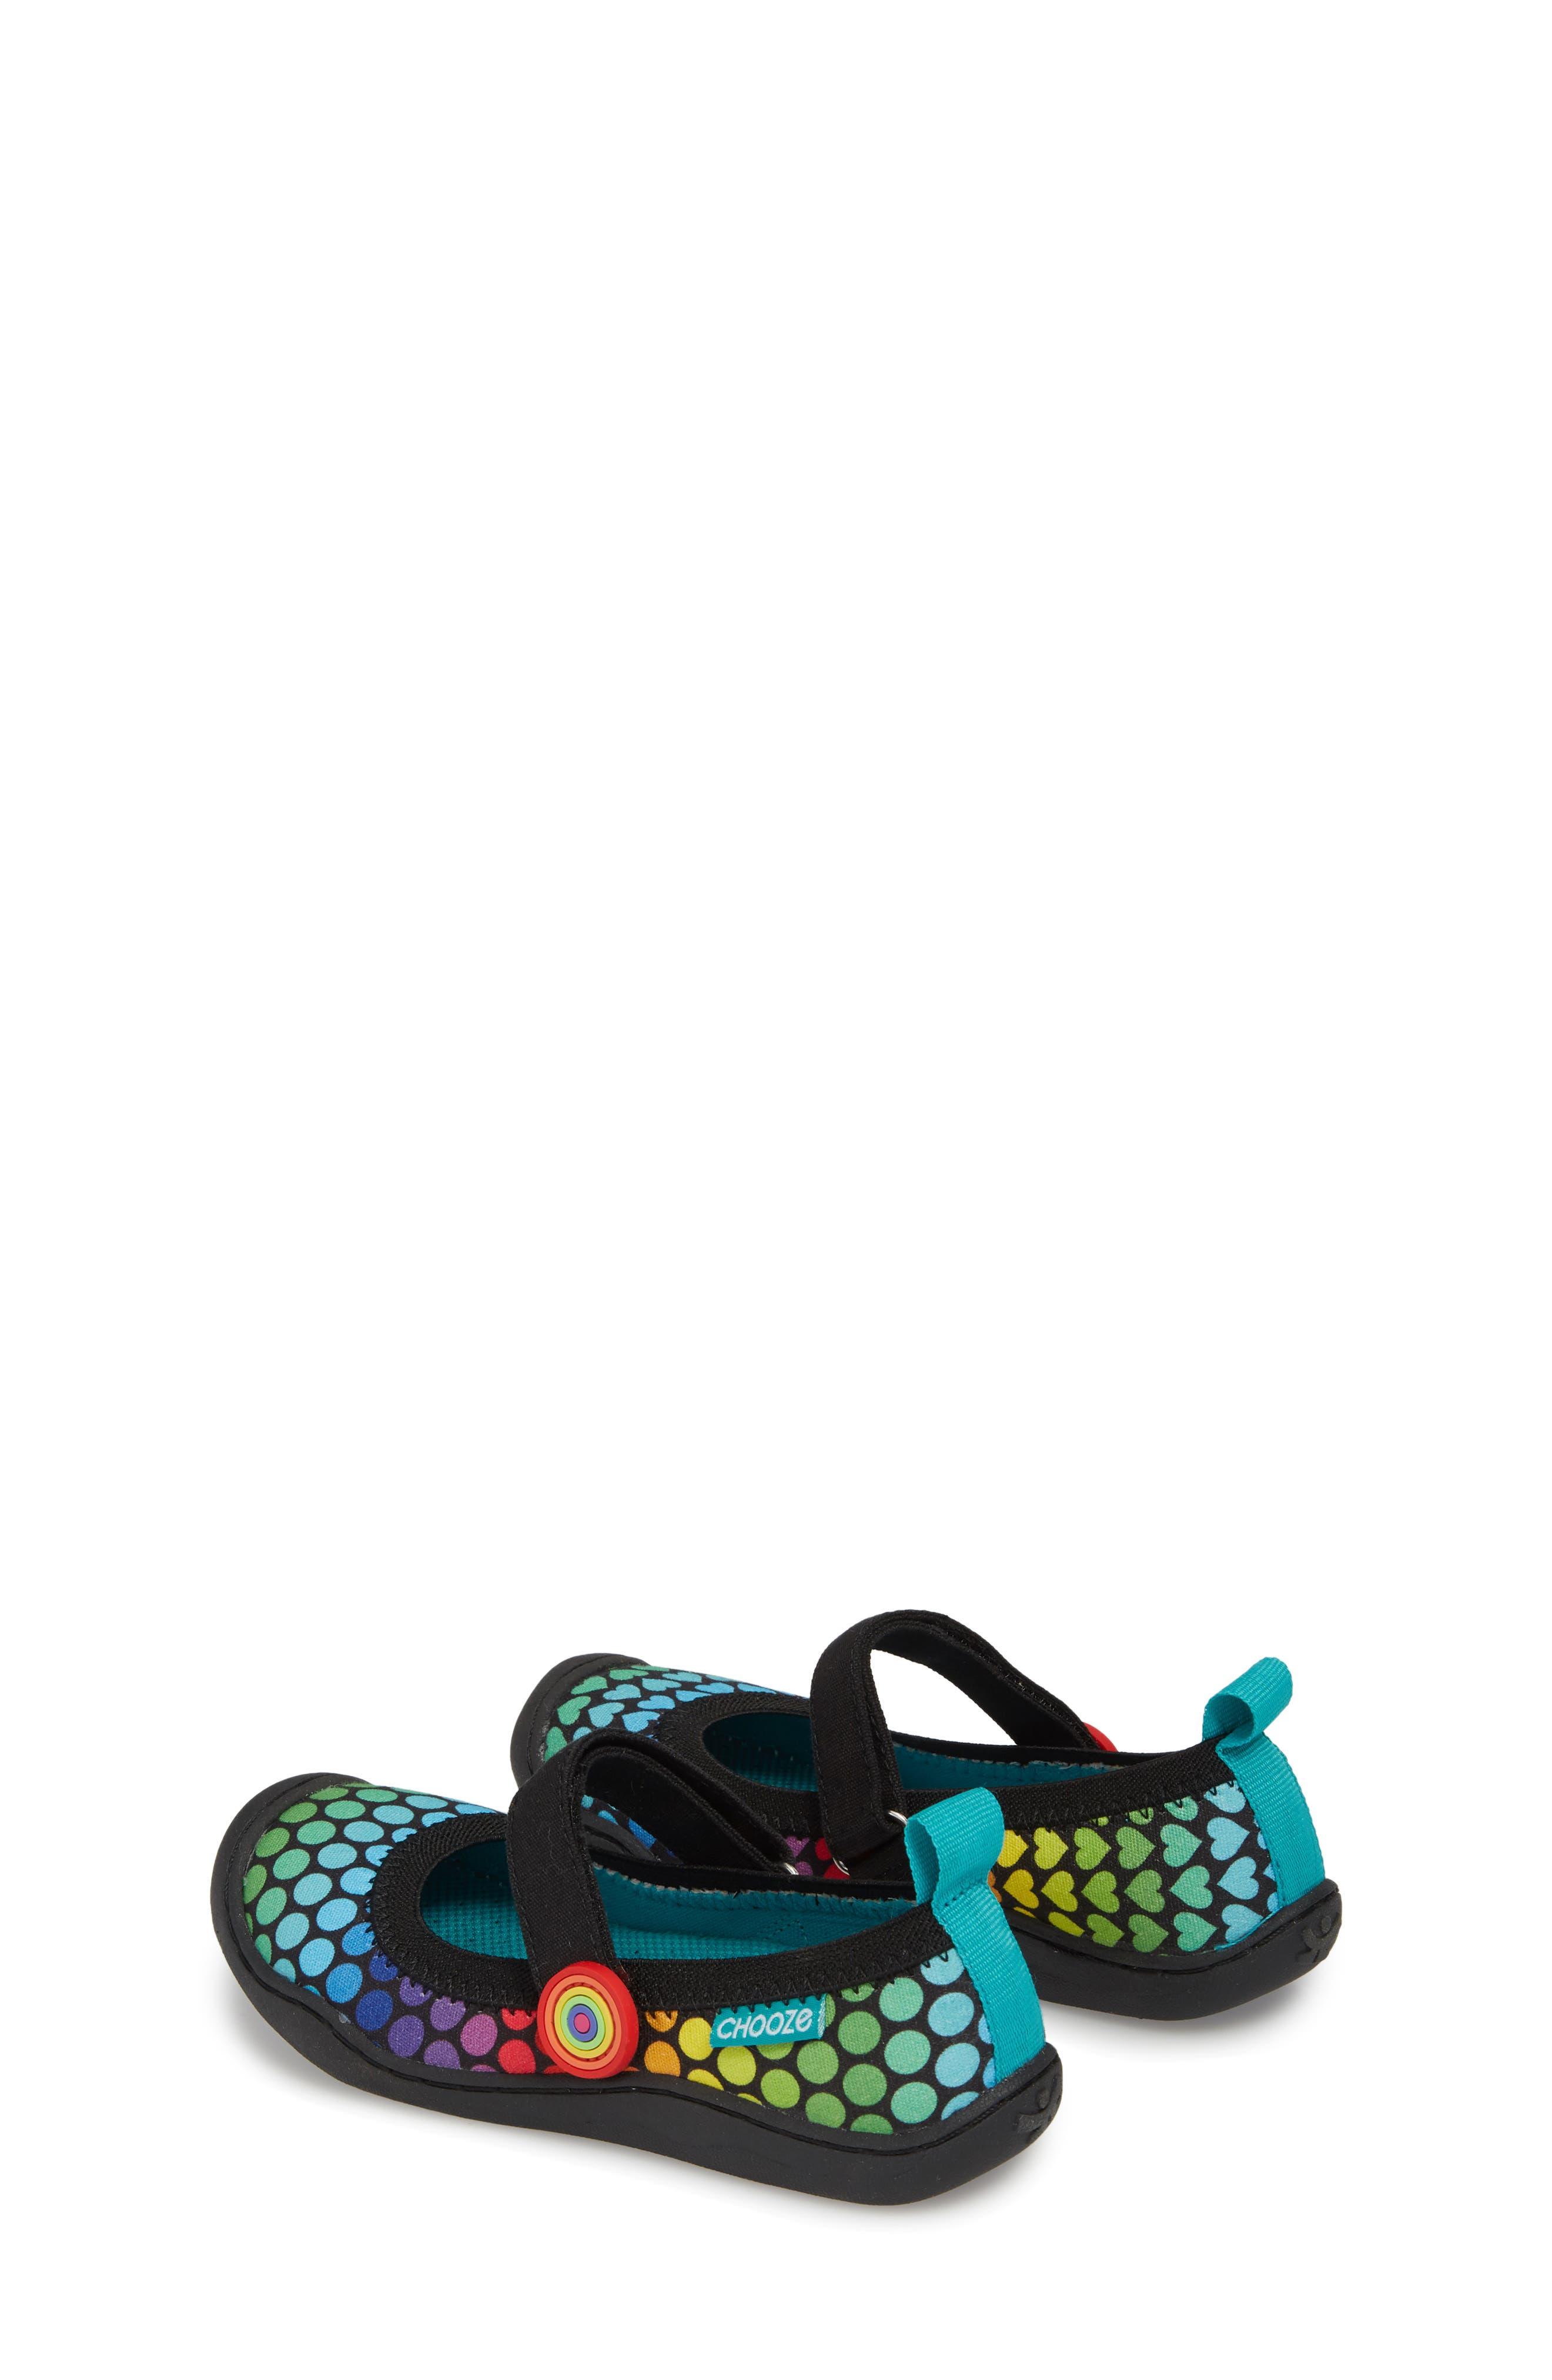 Steady Mary Jane Sneaker,                             Alternate thumbnail 2, color,                             Hue